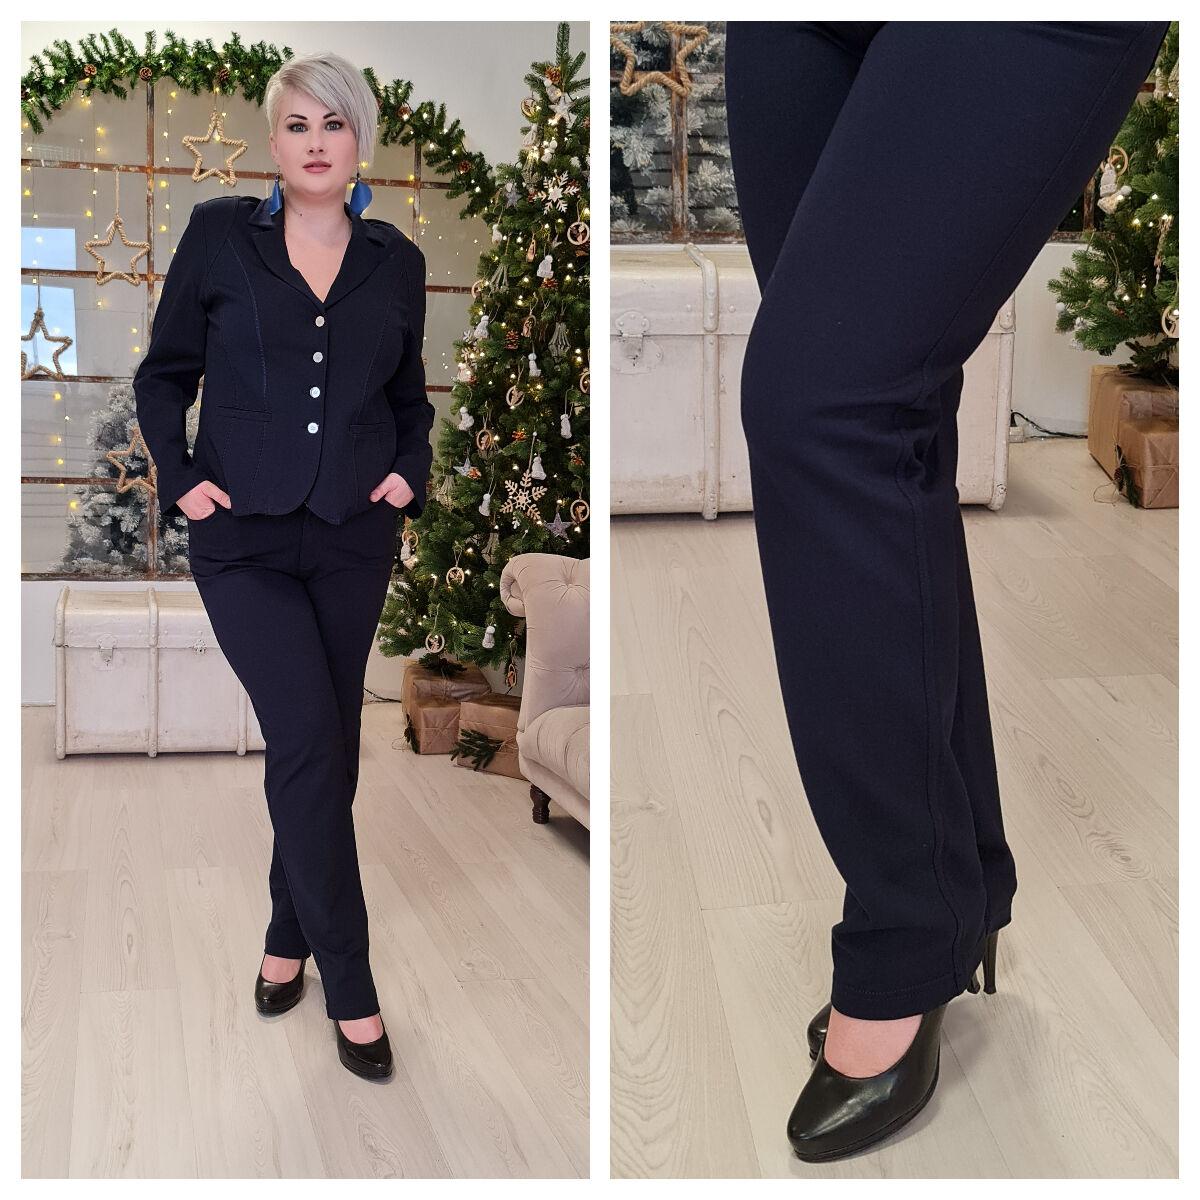 Matilde nadrág - nagyméretű Lafei-Nier kék nadrág